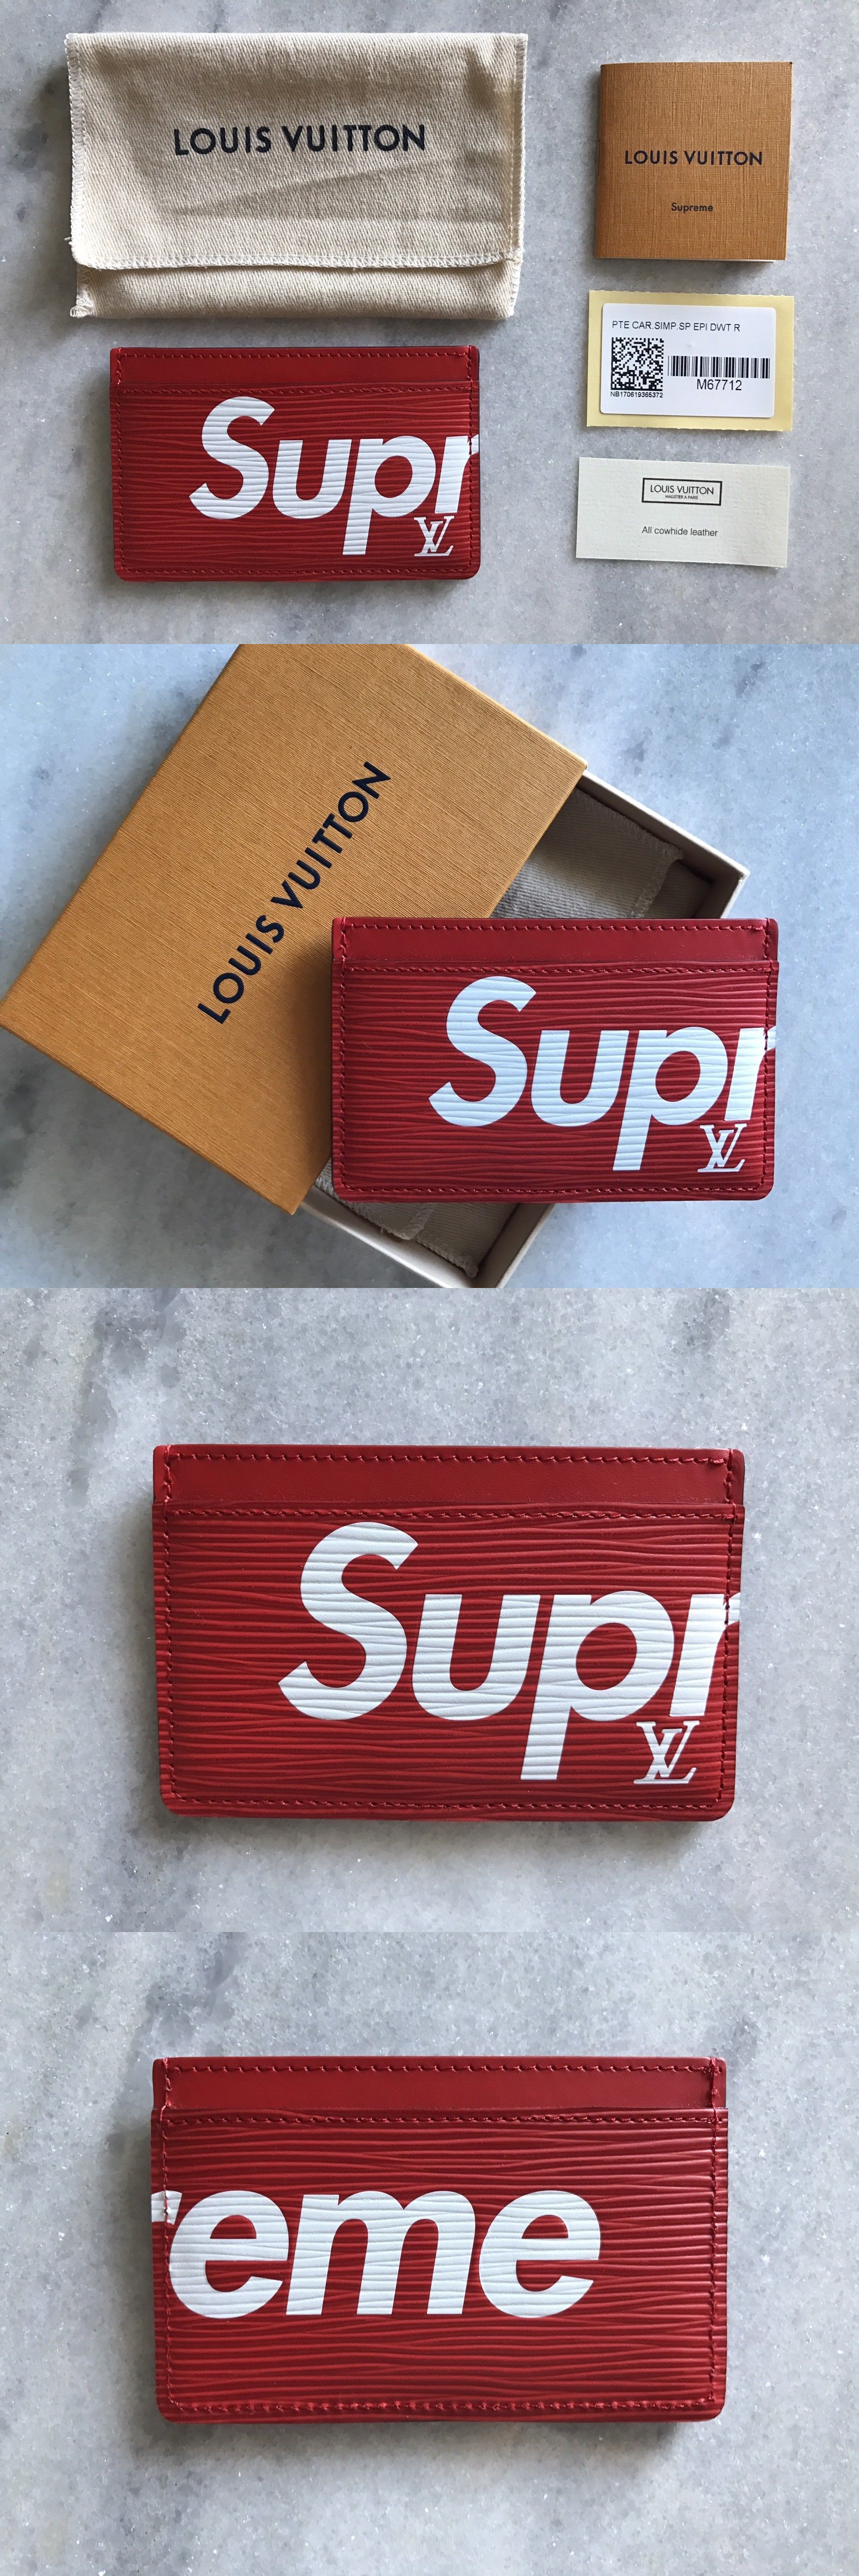 3144c4b0316ac Normal  Wallets 2996 Authentic Louis Vuitton X Supreme Card Holder Wallet  Red Epi Monogram Logo ...